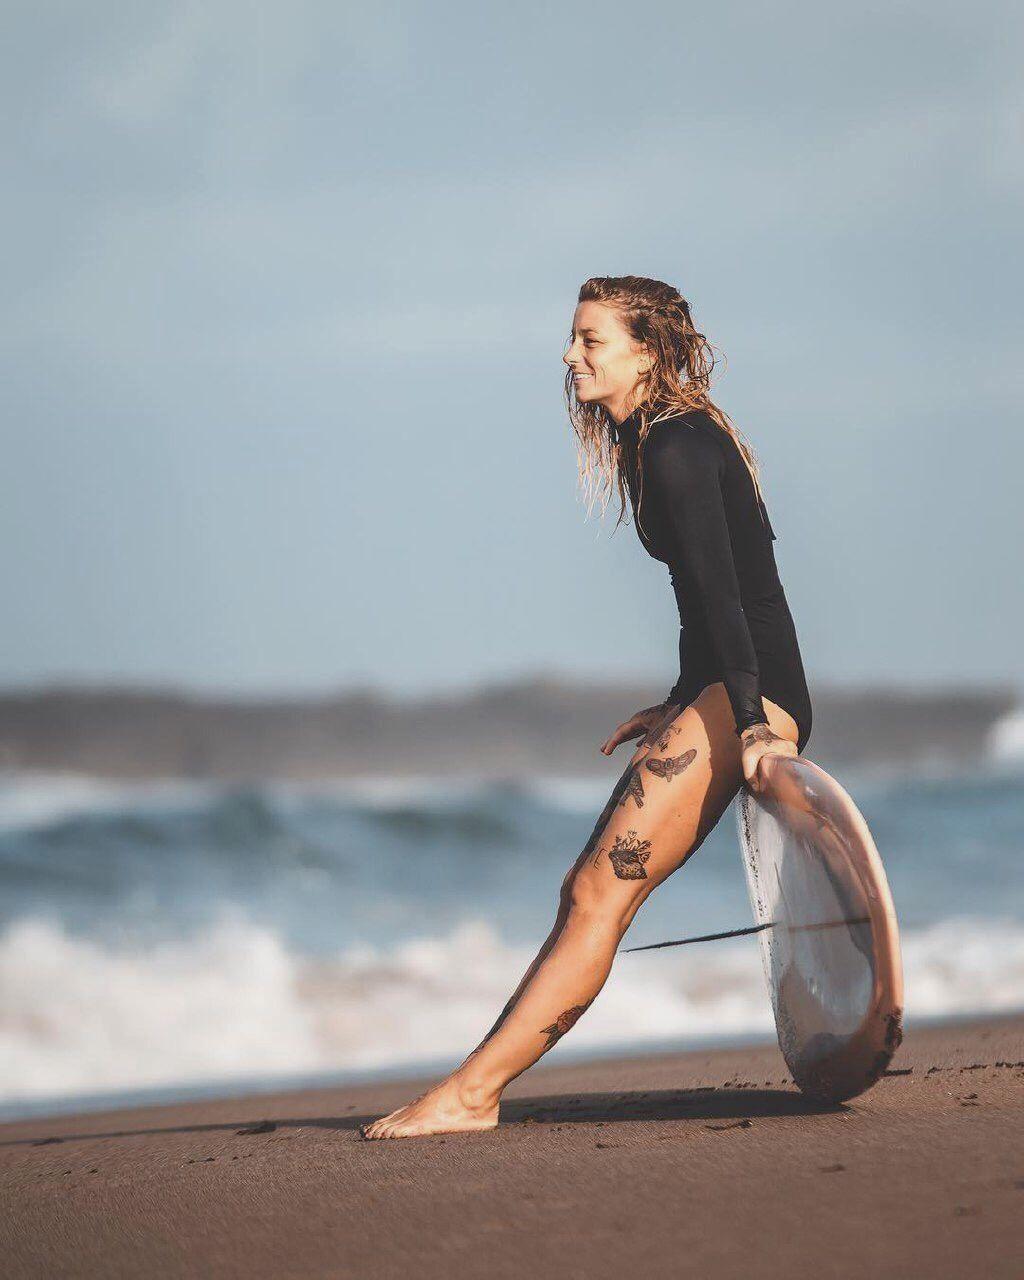 rip curl #alanablanchard alana blanchard age #surfer #swimsuit #alanablanchard rip curl #alanablanchard alana blanchard age #surfer #swimsuit #alanablanchard rip curl #alanablanchard alana blanchard age #surfer #swimsuit #alanablanchard rip curl #alanablanchard alana blanchard age #surfer #swimsuit #alanablanchard rip curl #alanablanchard alana blanchard age #surfer #swimsuit #alanablanchard rip curl #alanablanchard alana blanchard age #surfer #swimsuit #alanablanchard rip curl #alanablanchard a #alanablanchard